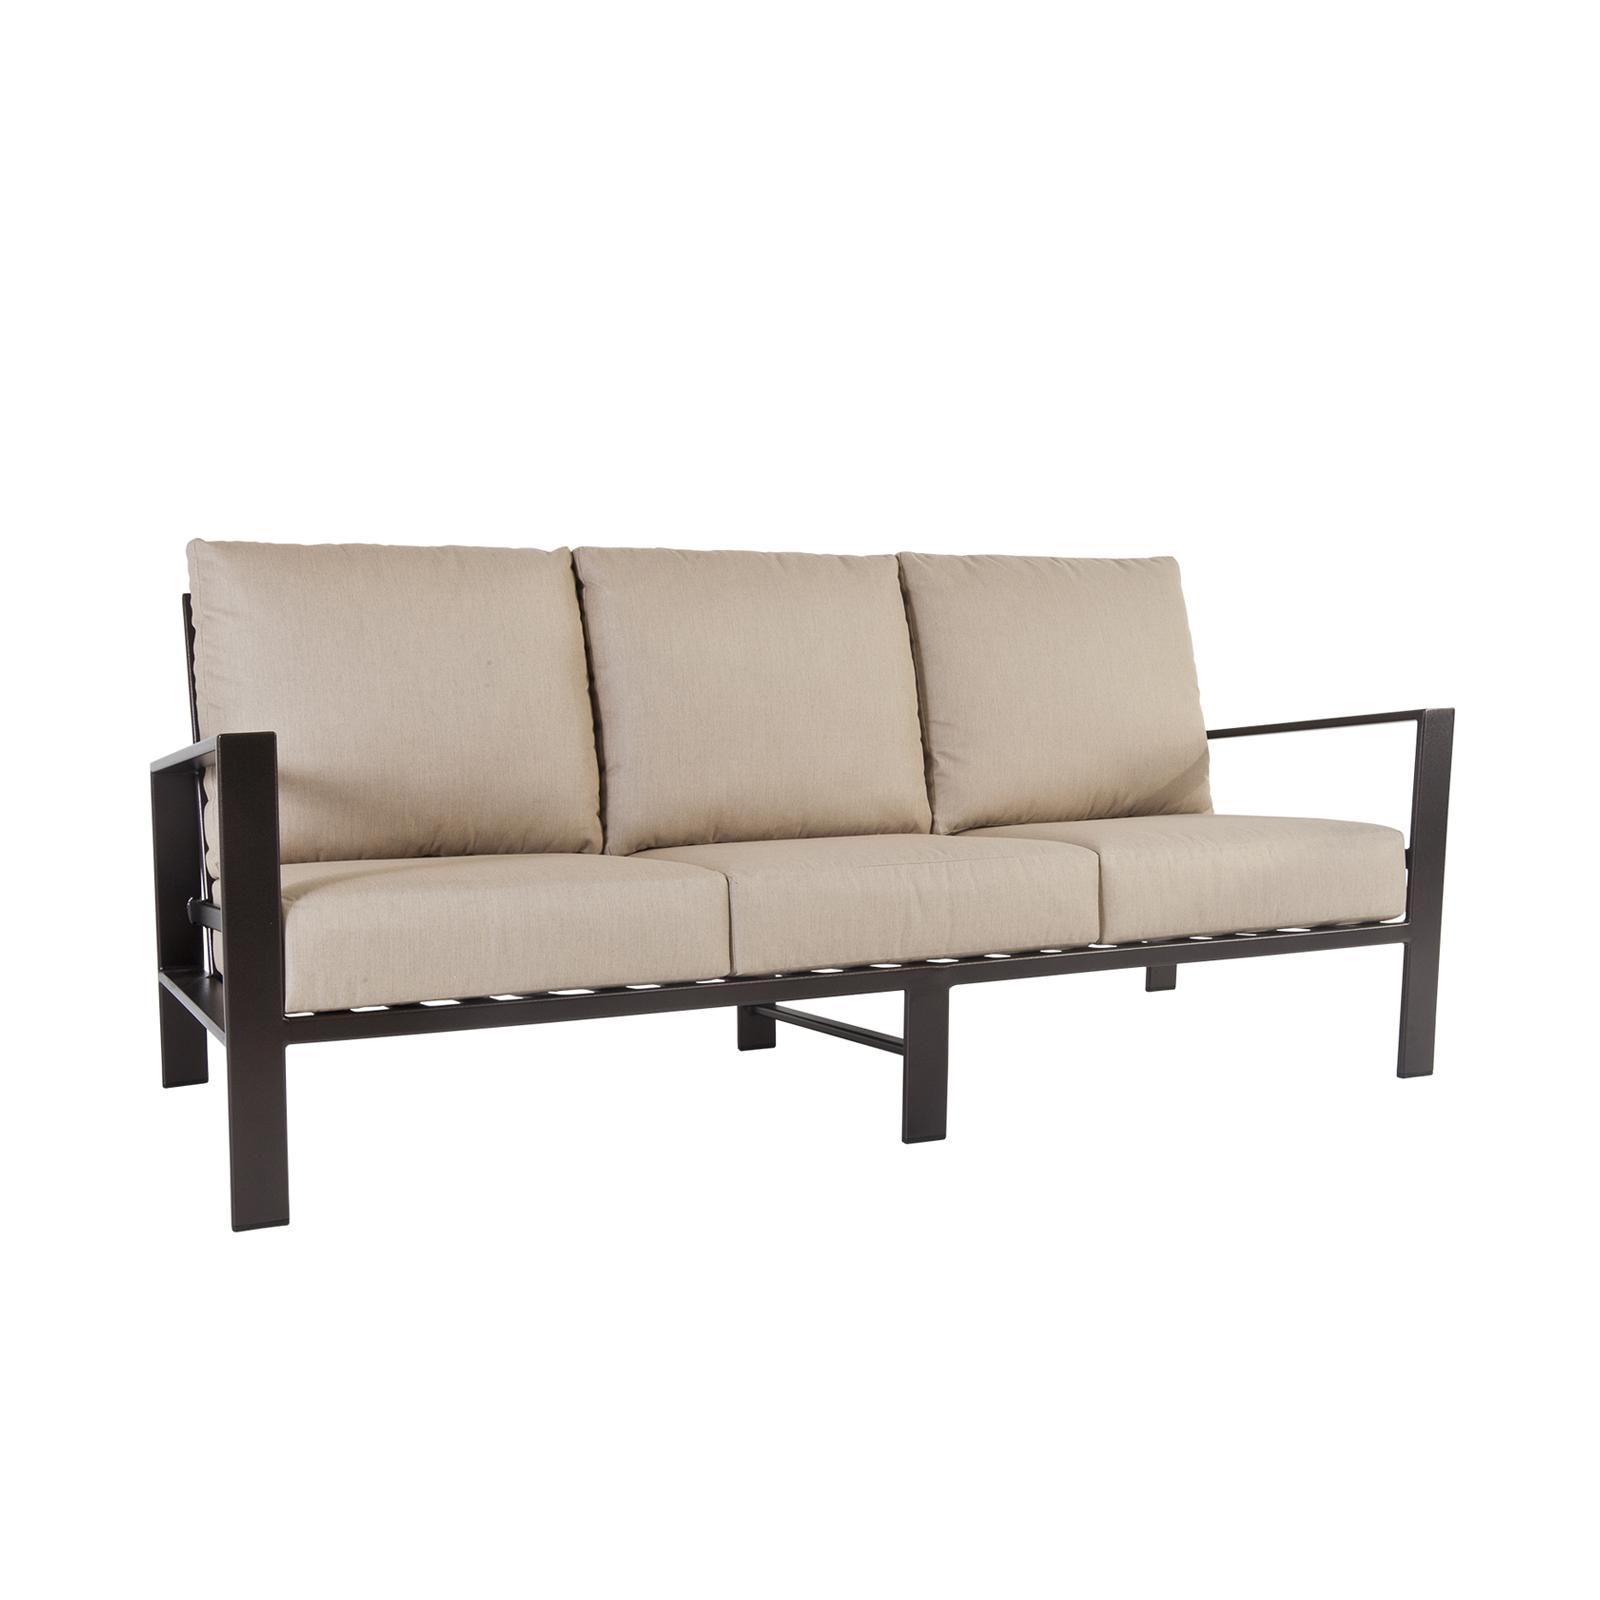 Sofa copy.jpg